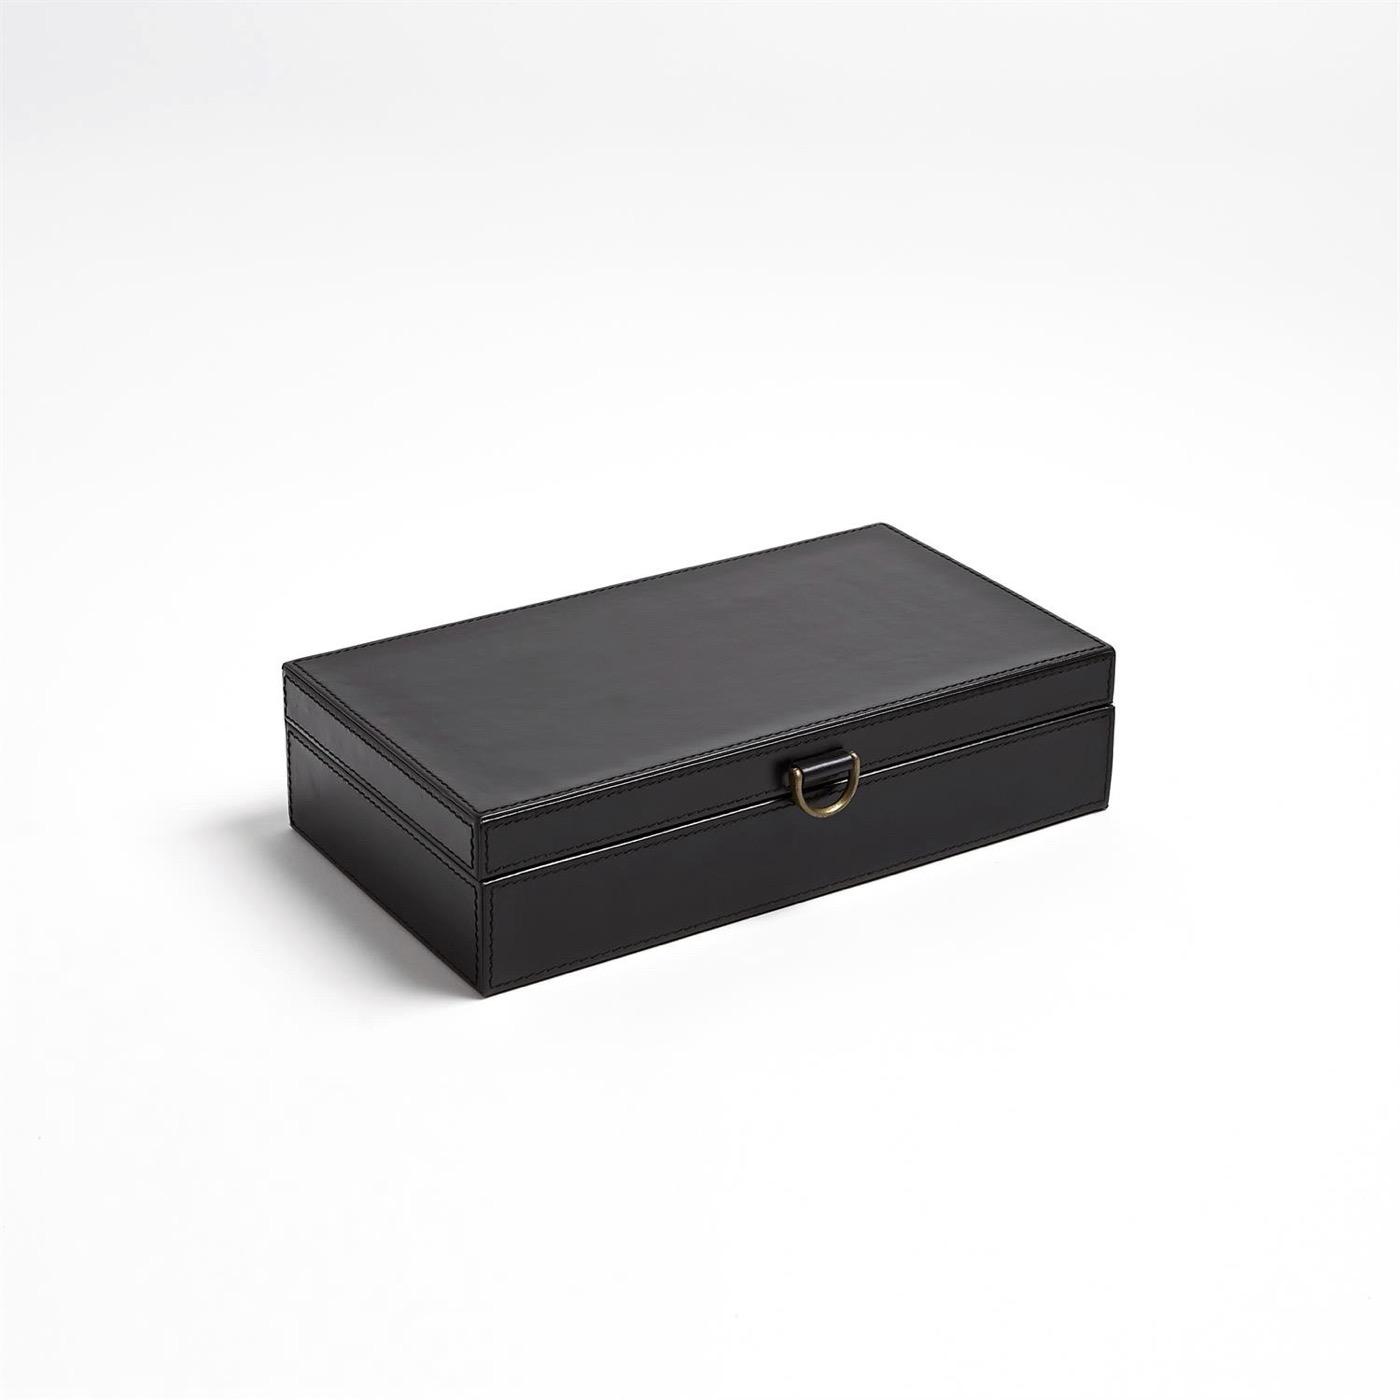 Colton Leather Boxes | Black